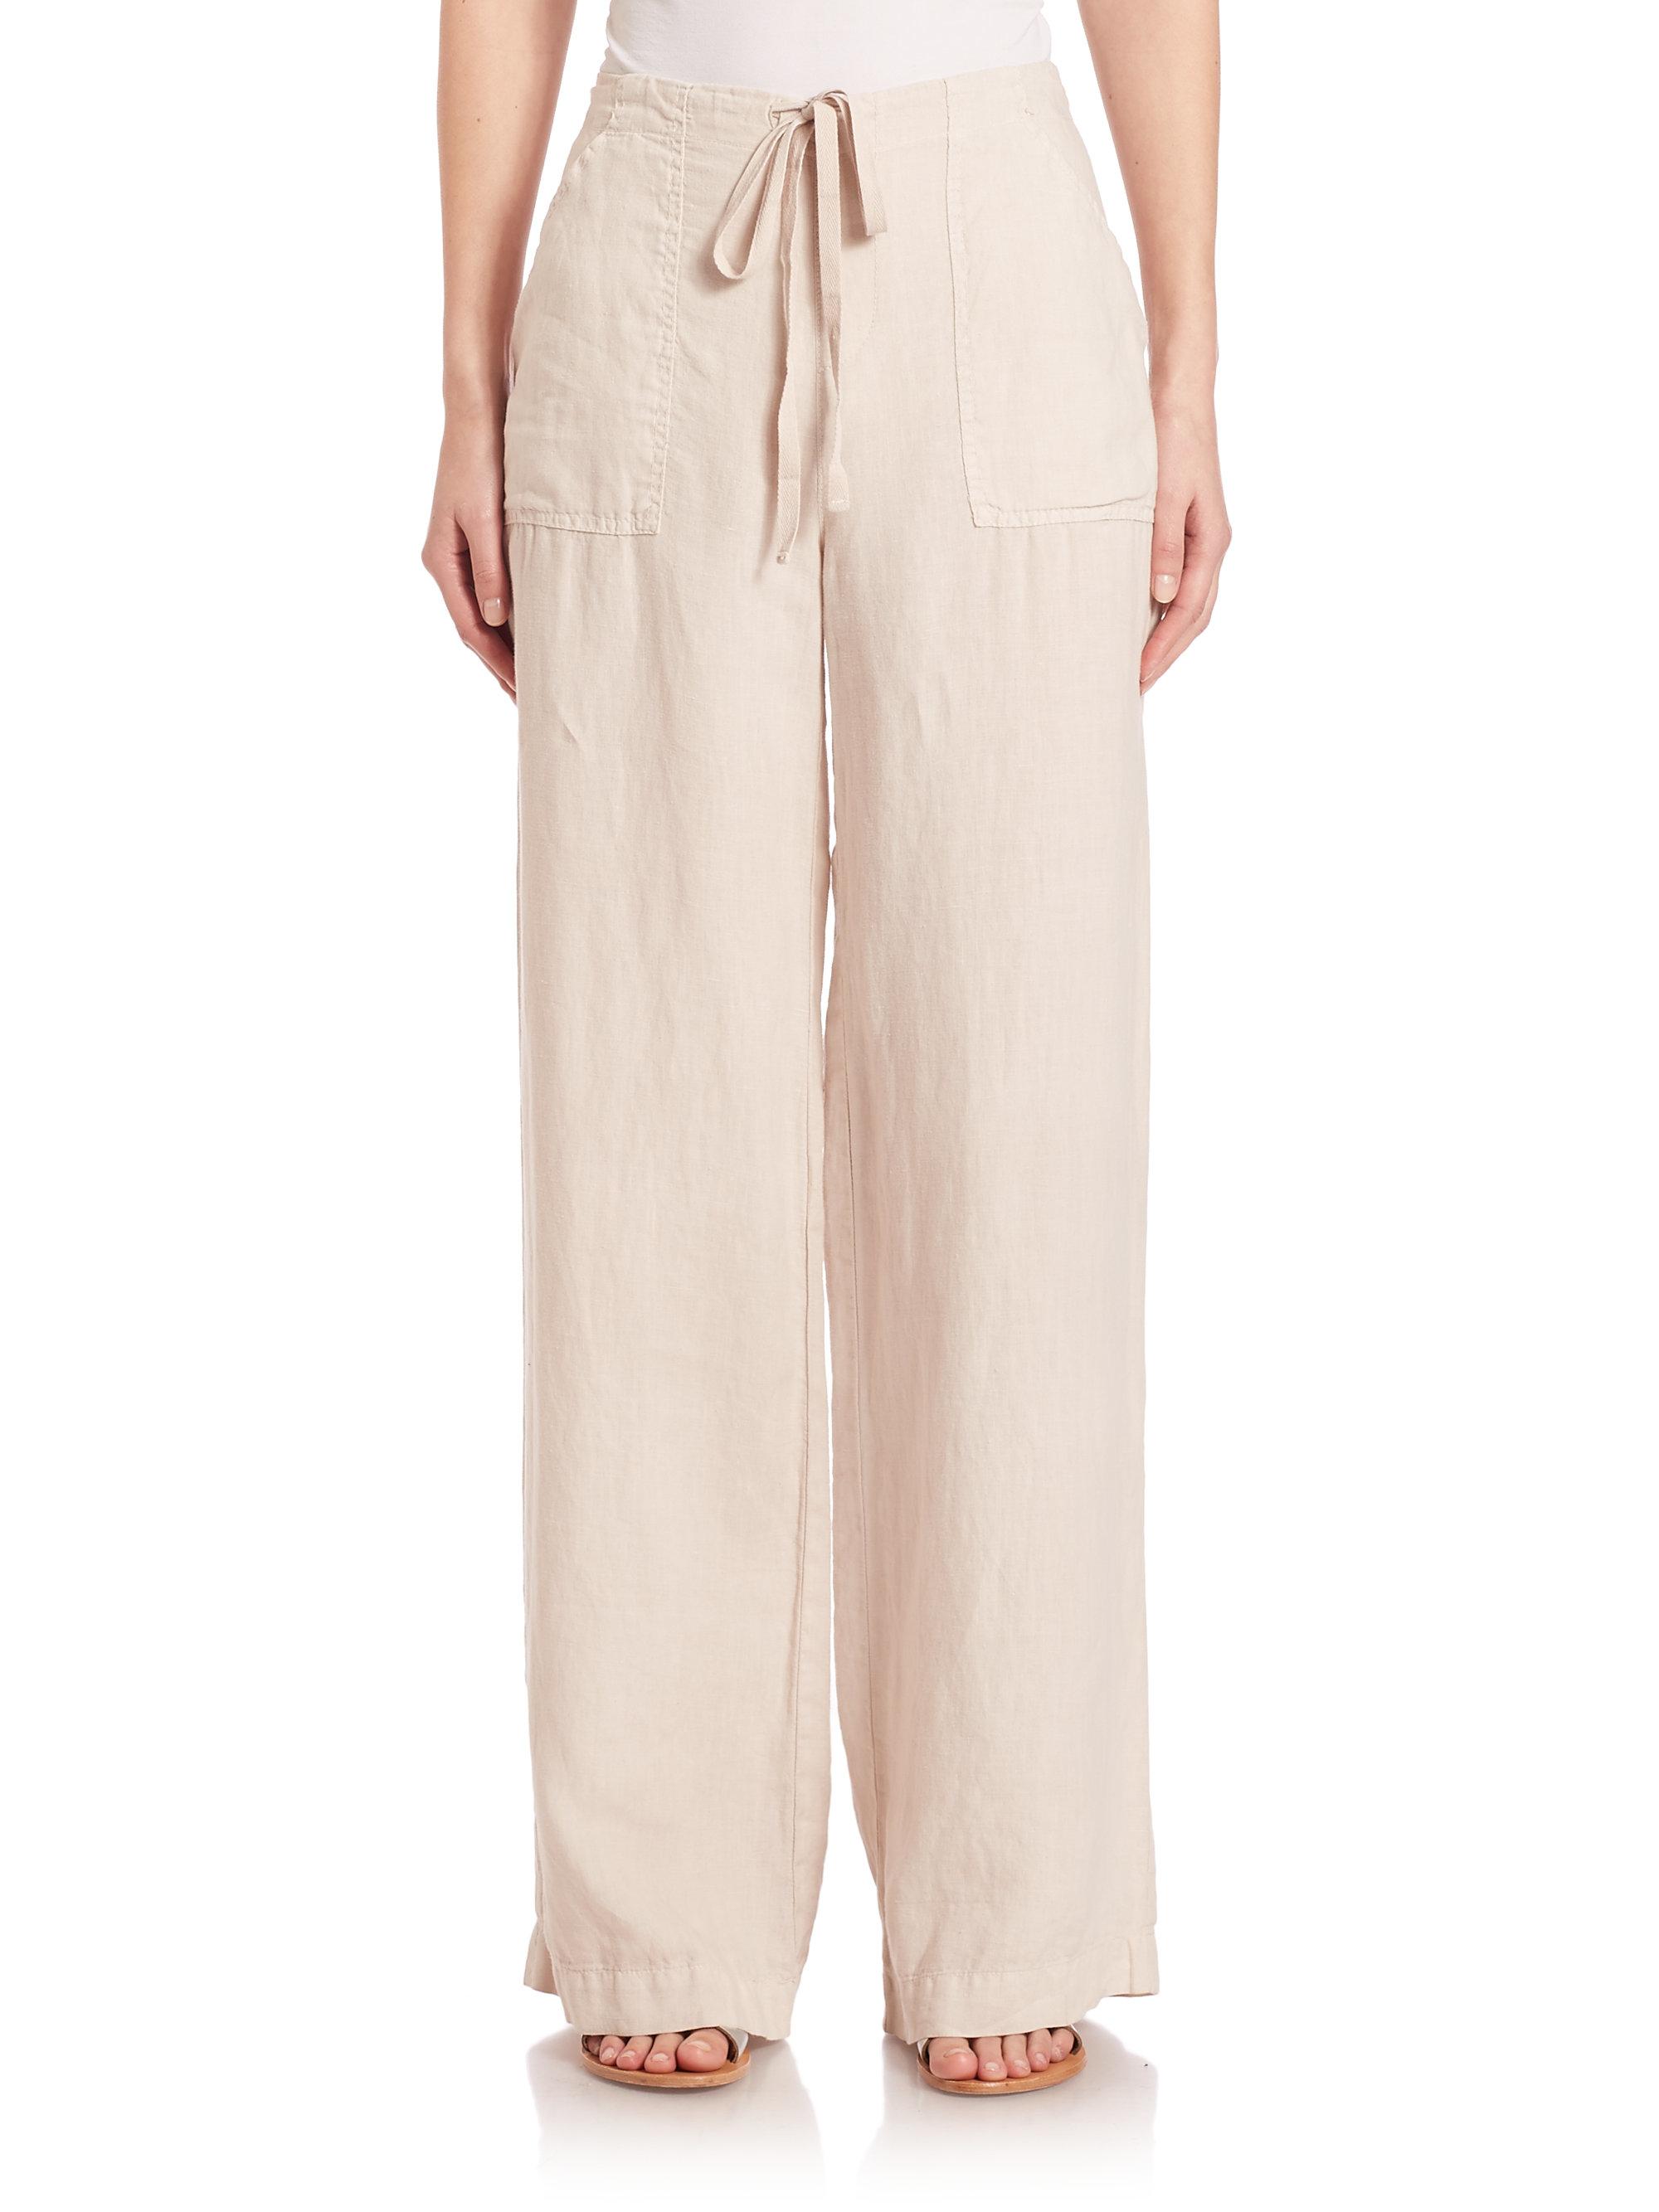 Flax Linen Drawstring Pants Pant So